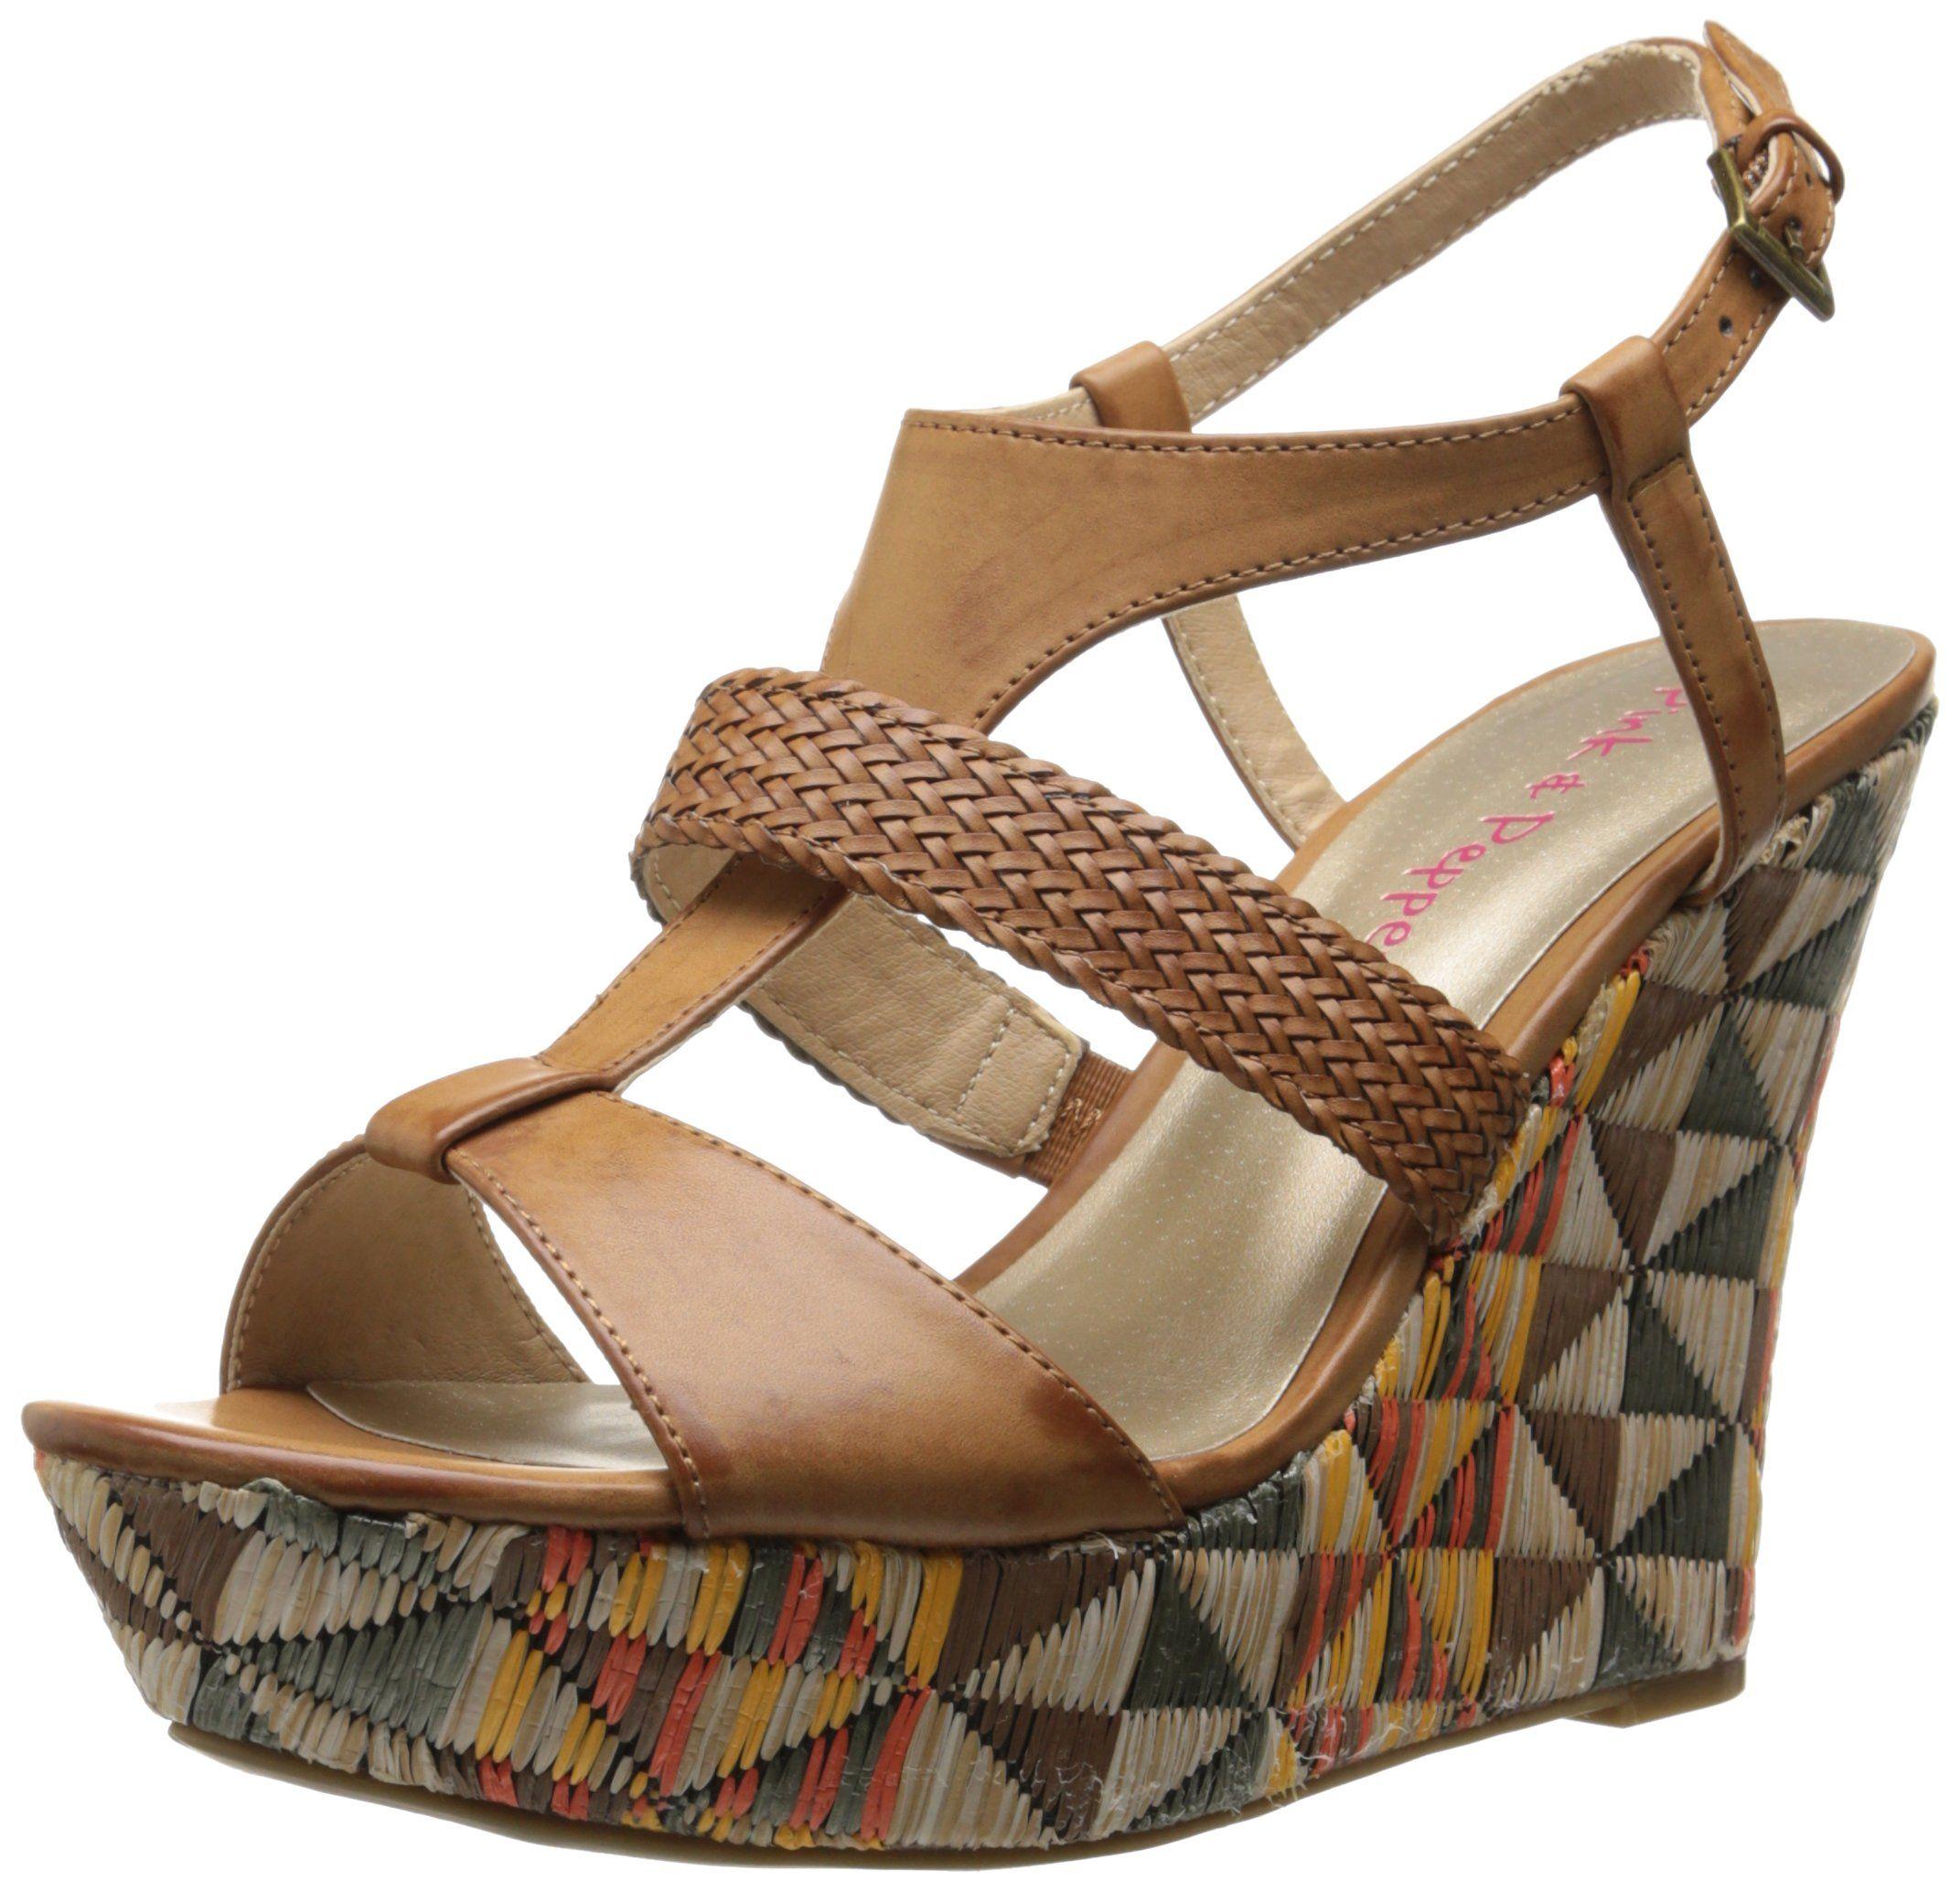 Pink & Pepper Women's Desired Wedge Sandal, Tan, 8.5 M US